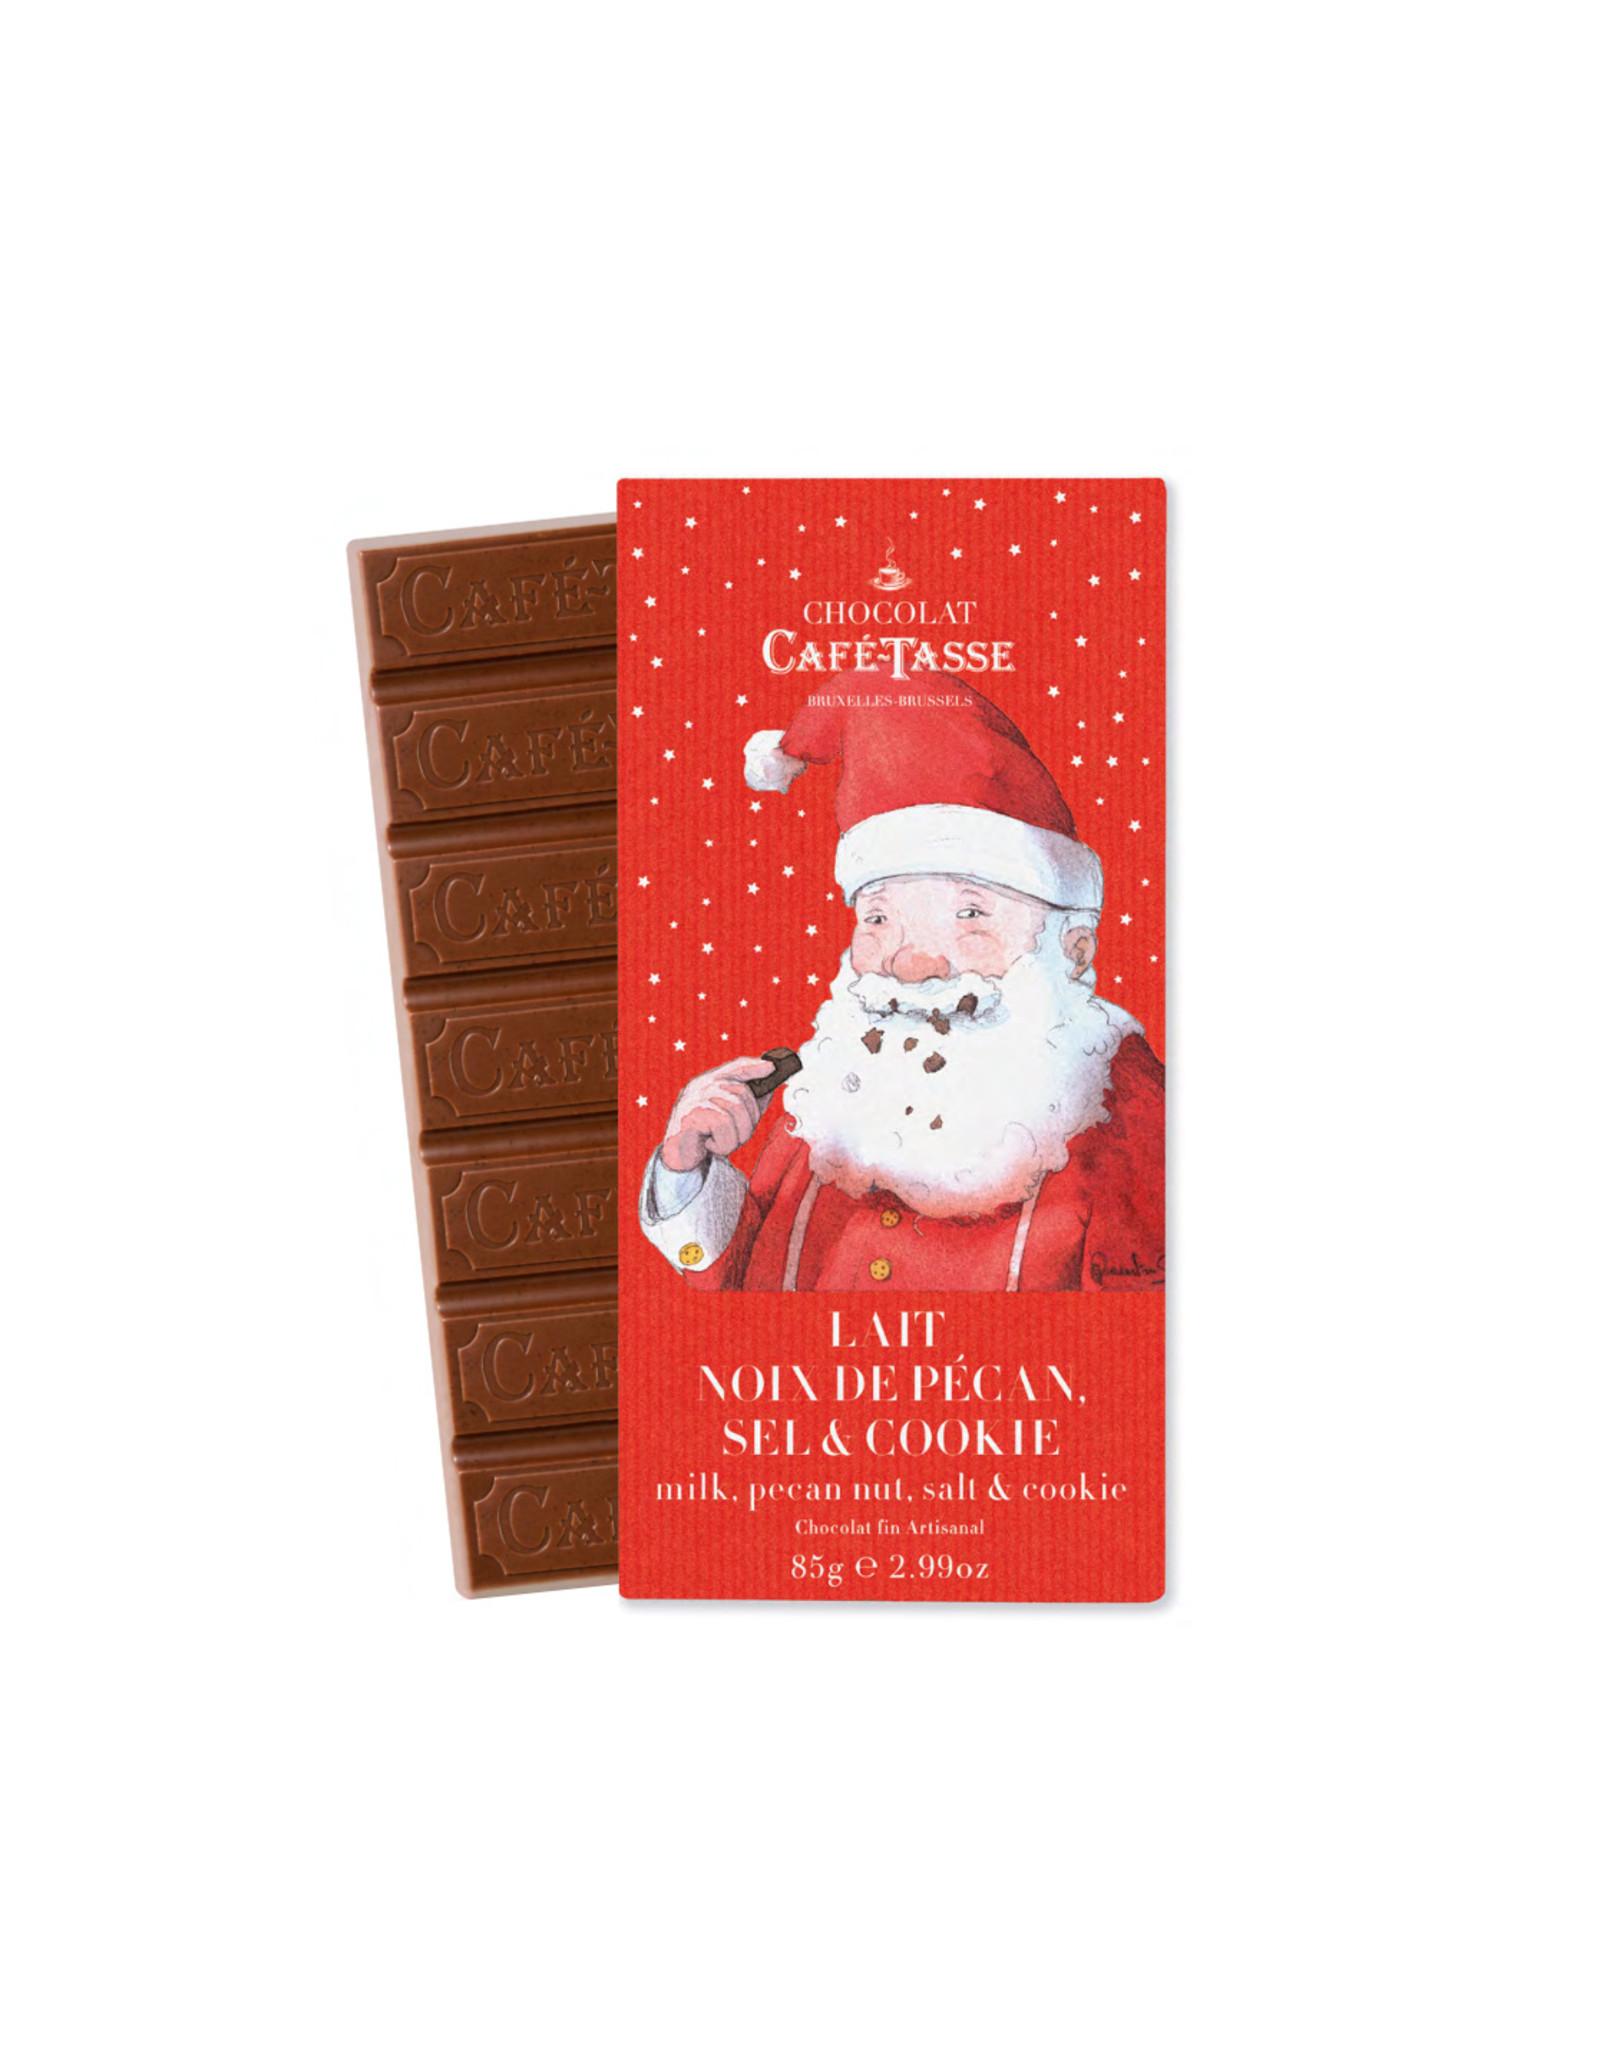 Café-Tasse CHOCOLADEREEP - MELKCHOCOLADE - PECANNOTEN, ZOUT & COOKIES